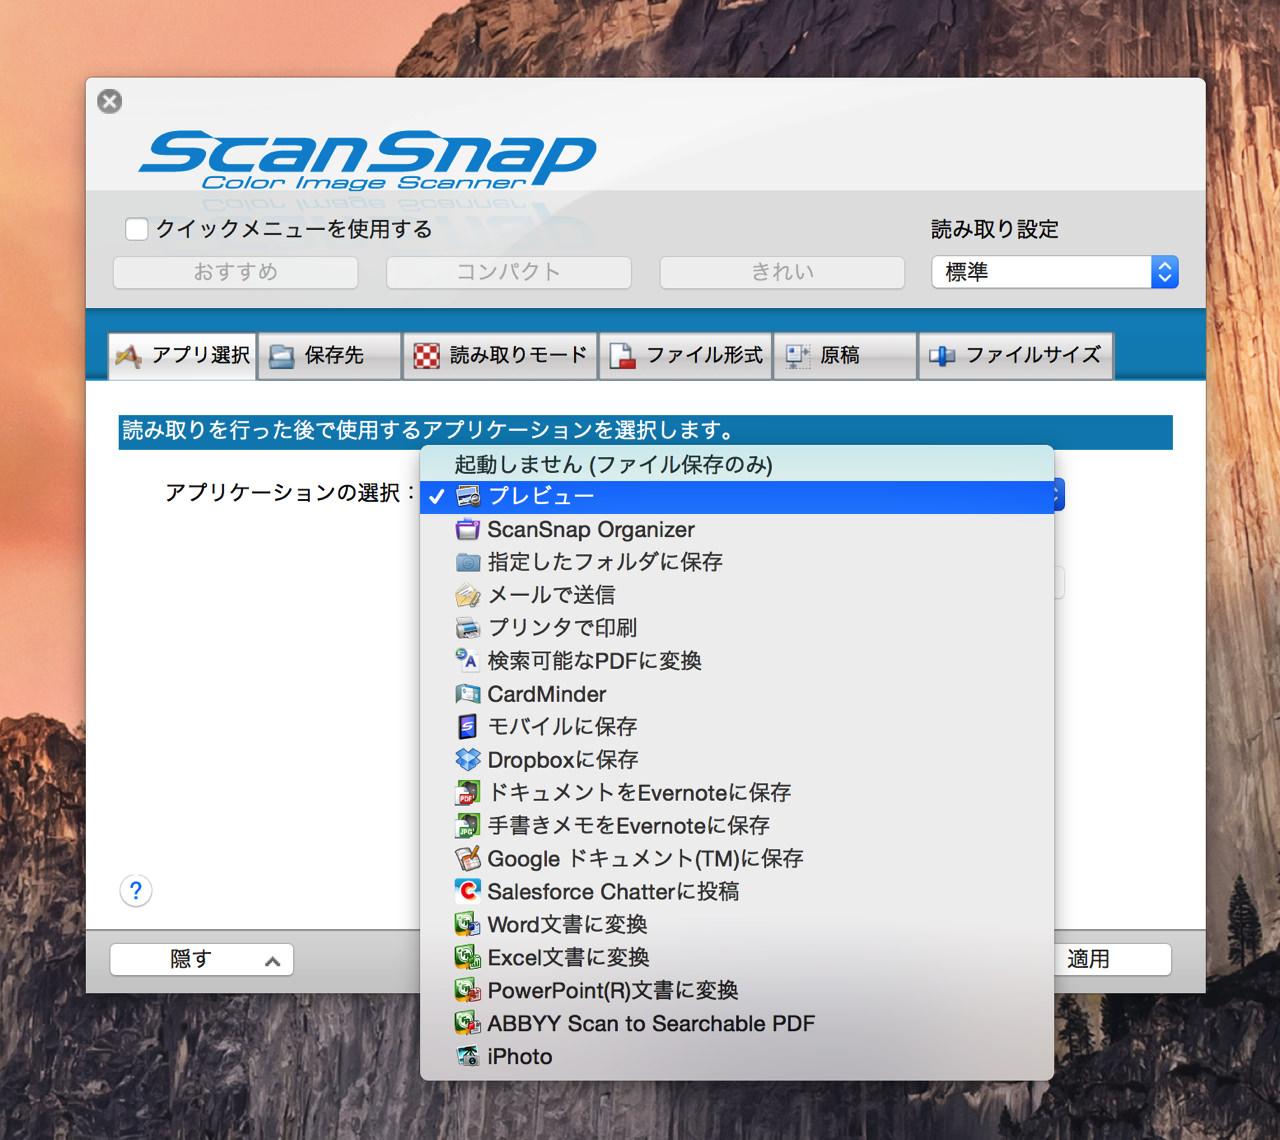 Fujitsu pfu scansnap ix100 snow white21